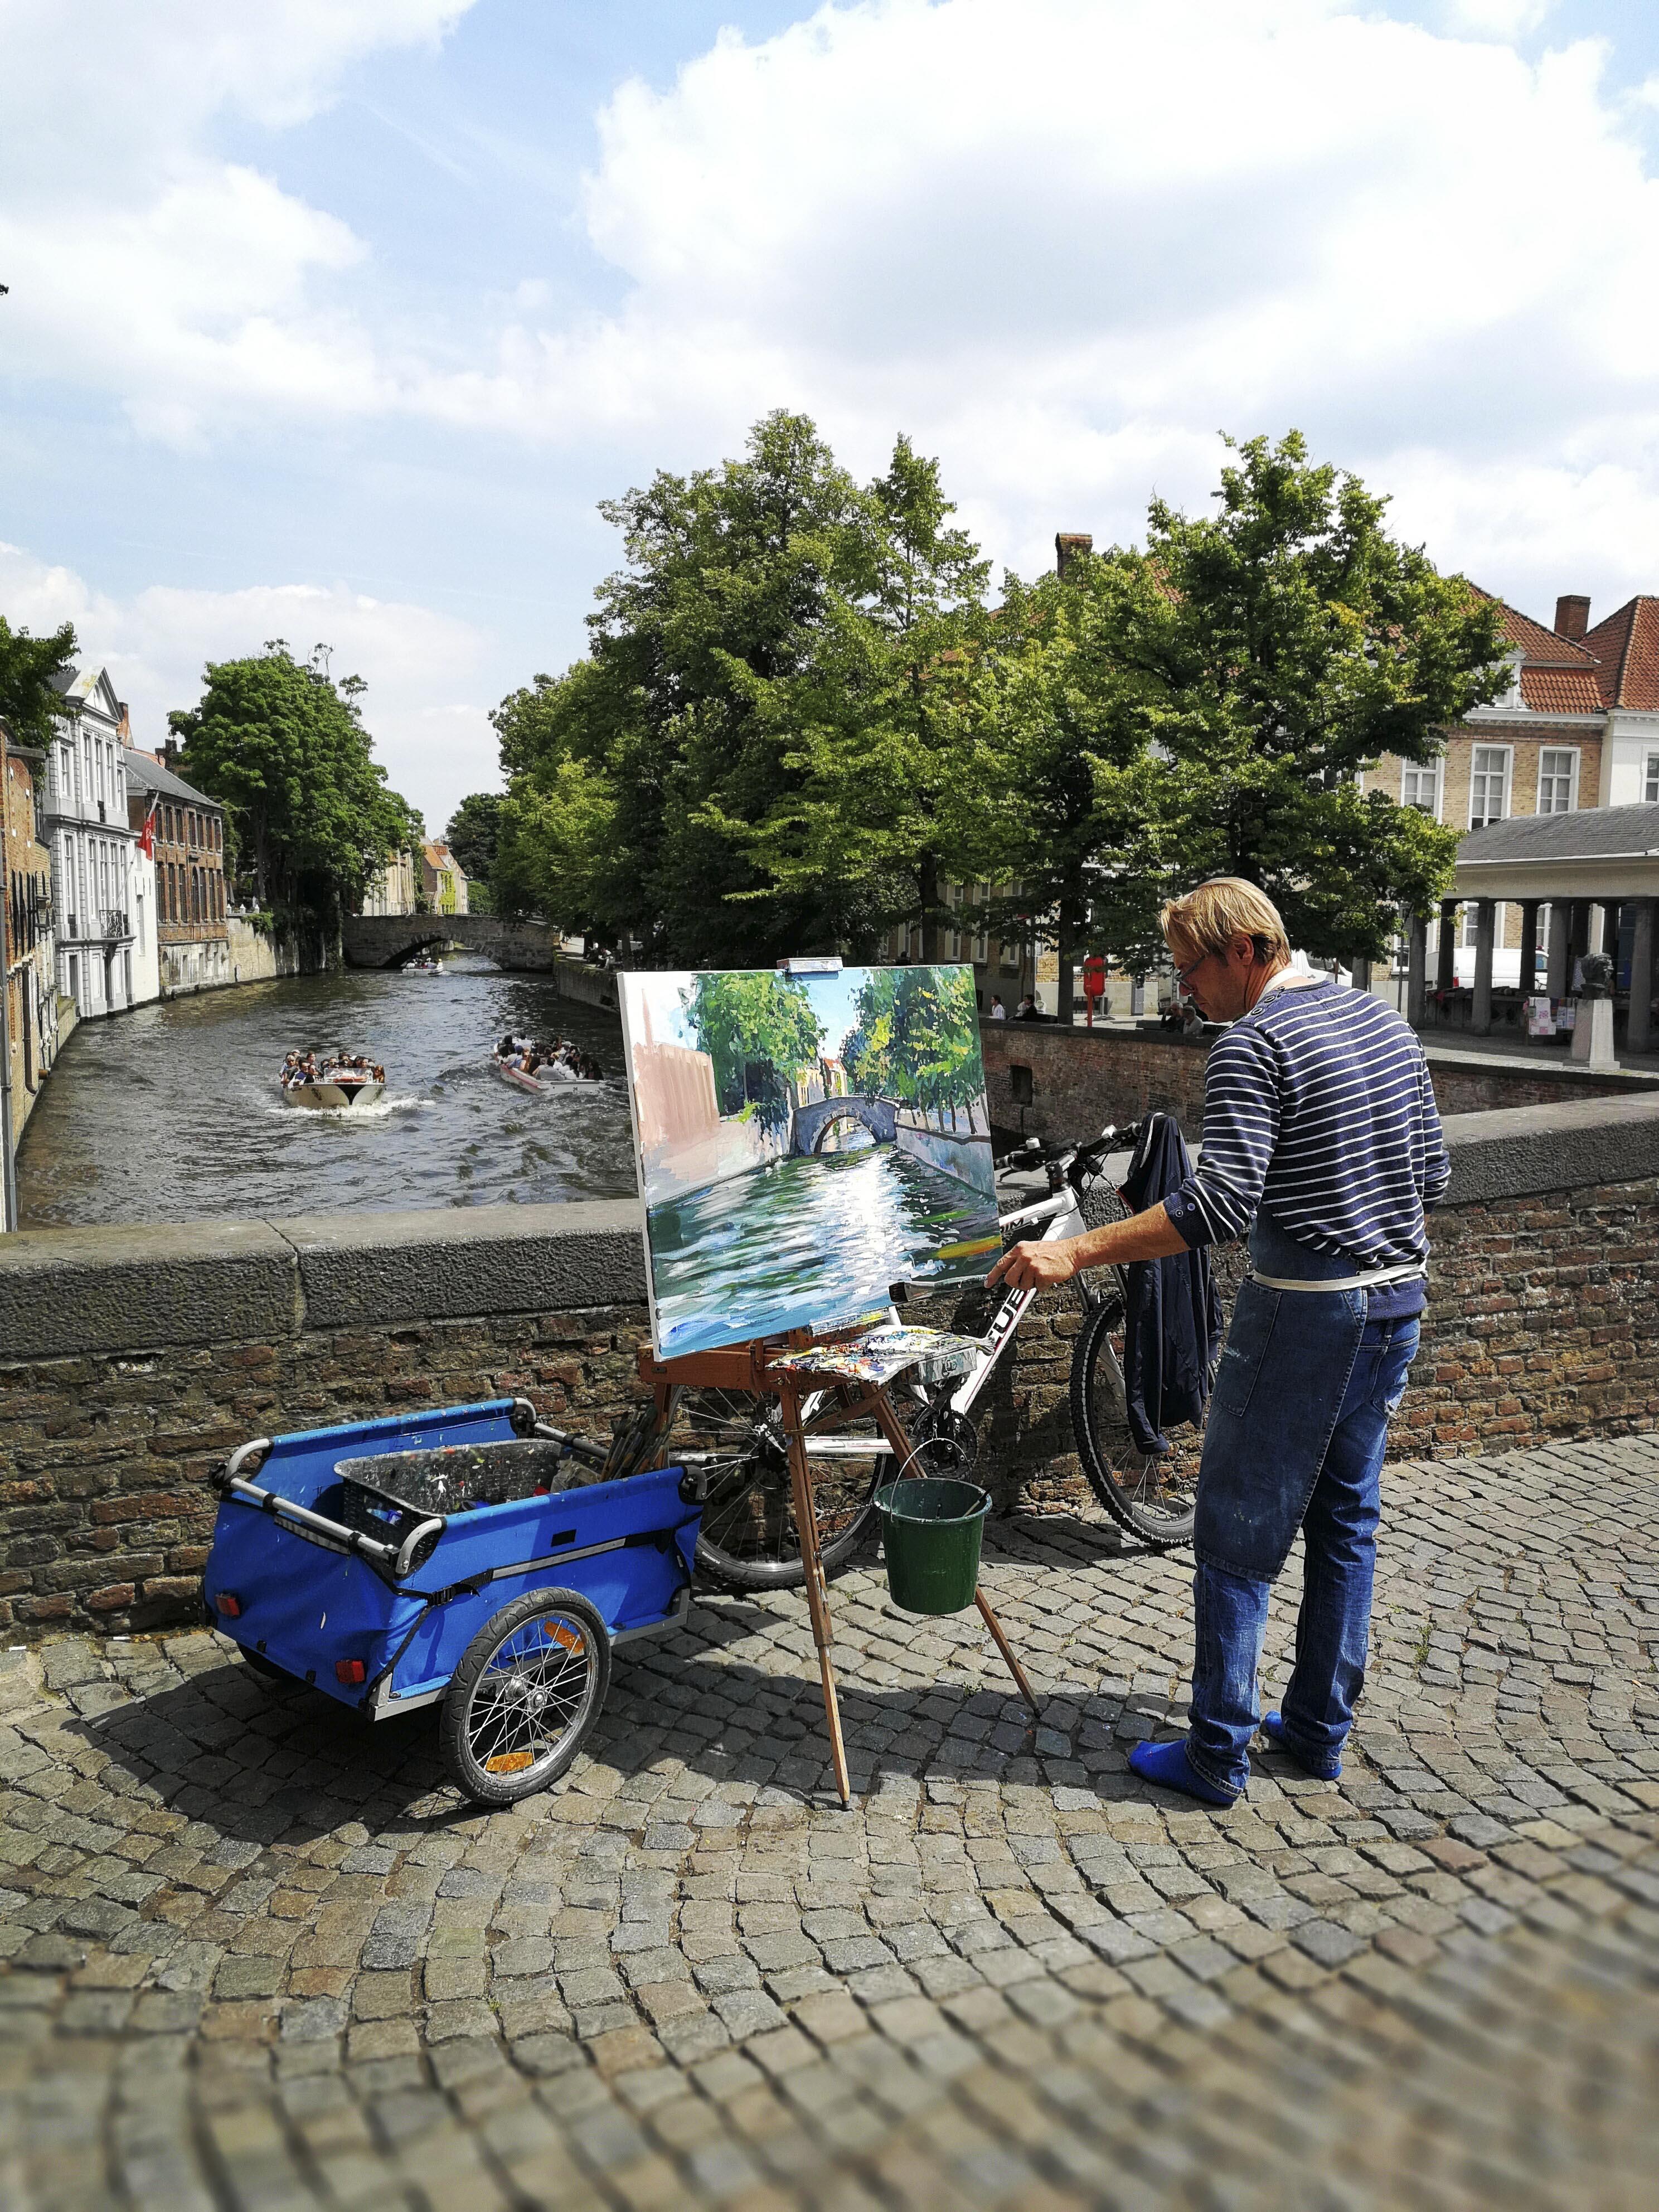 Städtetrip Brügge - Belgien - Restaurants Shops Sightseeing City Guide Sehenswürdigkeiten #brügge #bruges #belgien #belgium #cityguide | Emma´s Lieblingsstücke